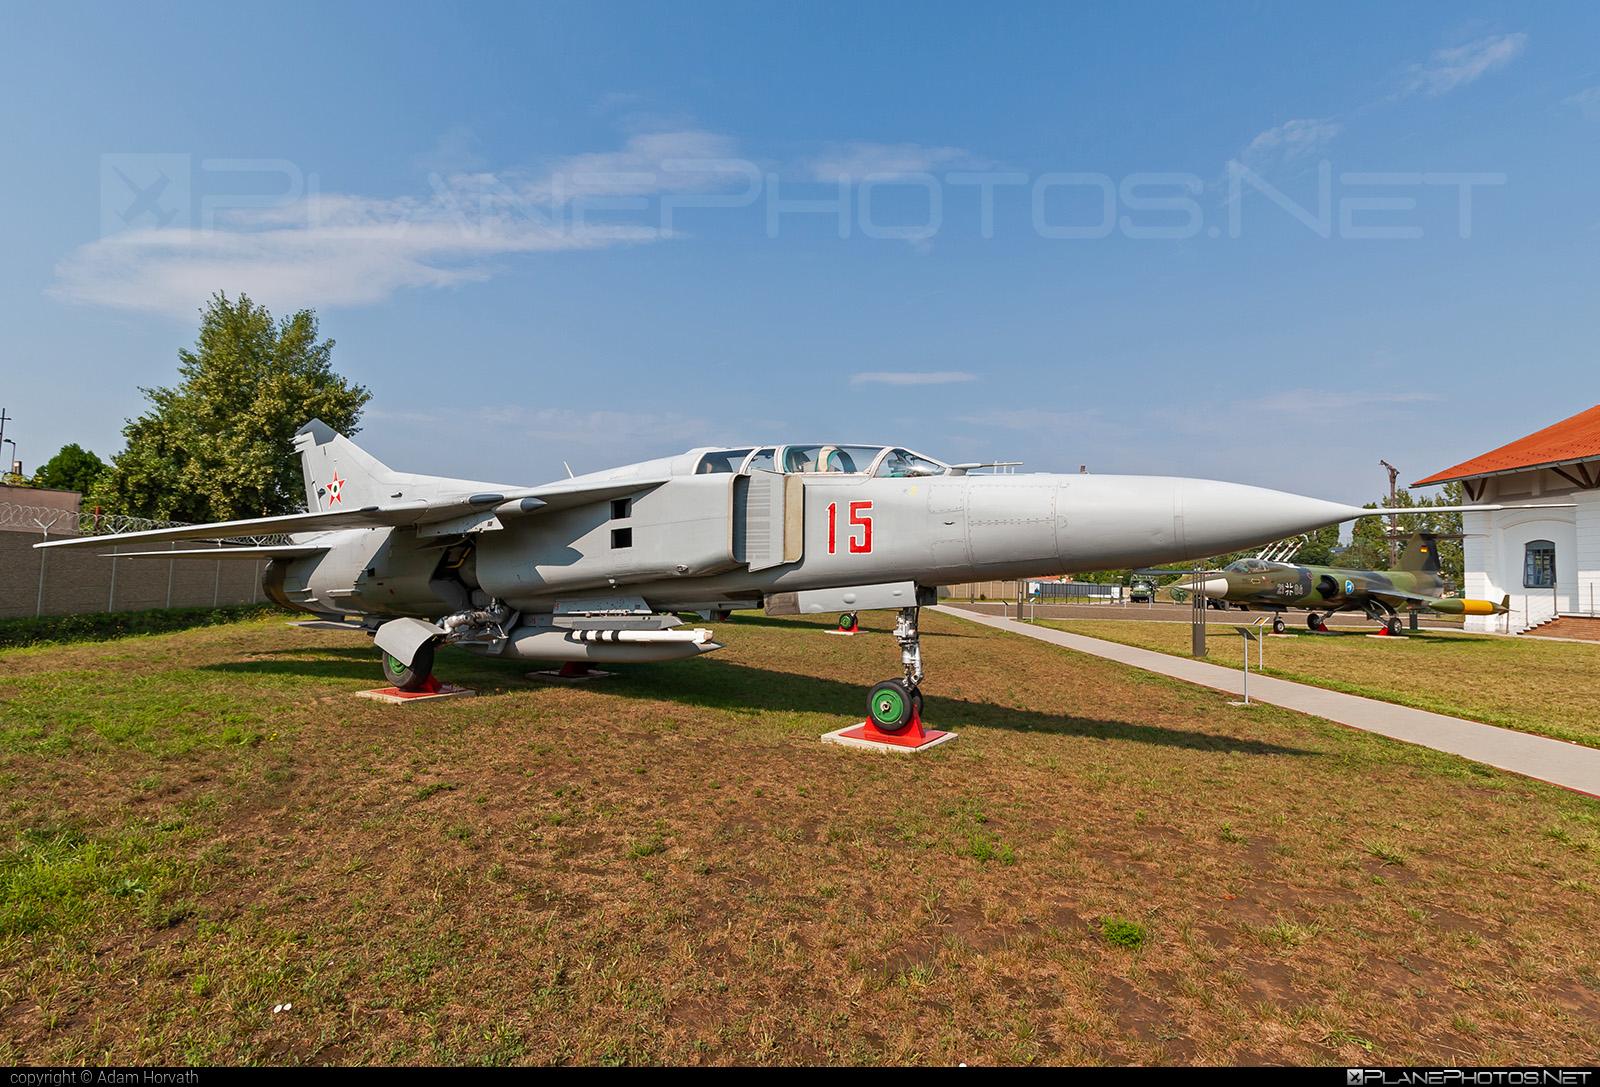 Mikoyan-Gurevich MiG-23UB - 15 operated by Magyar Légierő (Hungarian Air Force) #hungarianairforce #magyarlegiero #mig #mig23 #mig23ub #mikoyangurevich